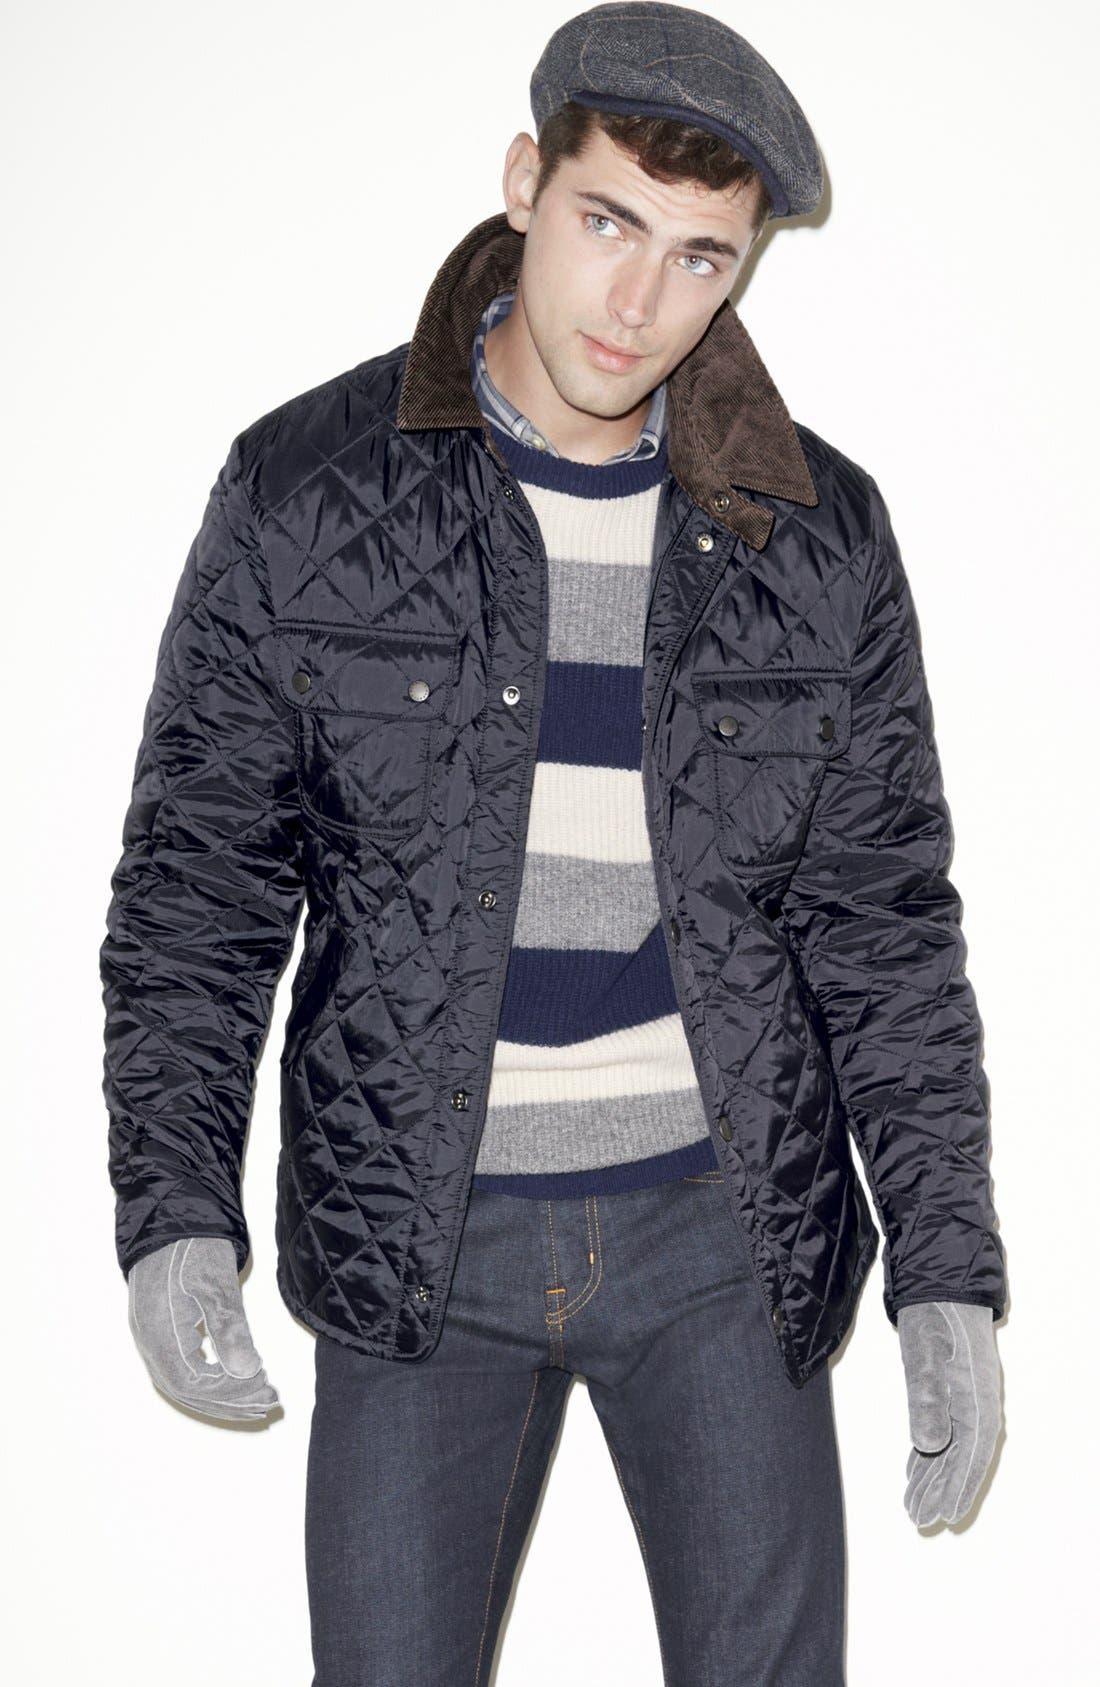 Alternate Image 1 Selected - Barbour Jacket, Gant Sweater & J Brand Skinny Fit Jeans